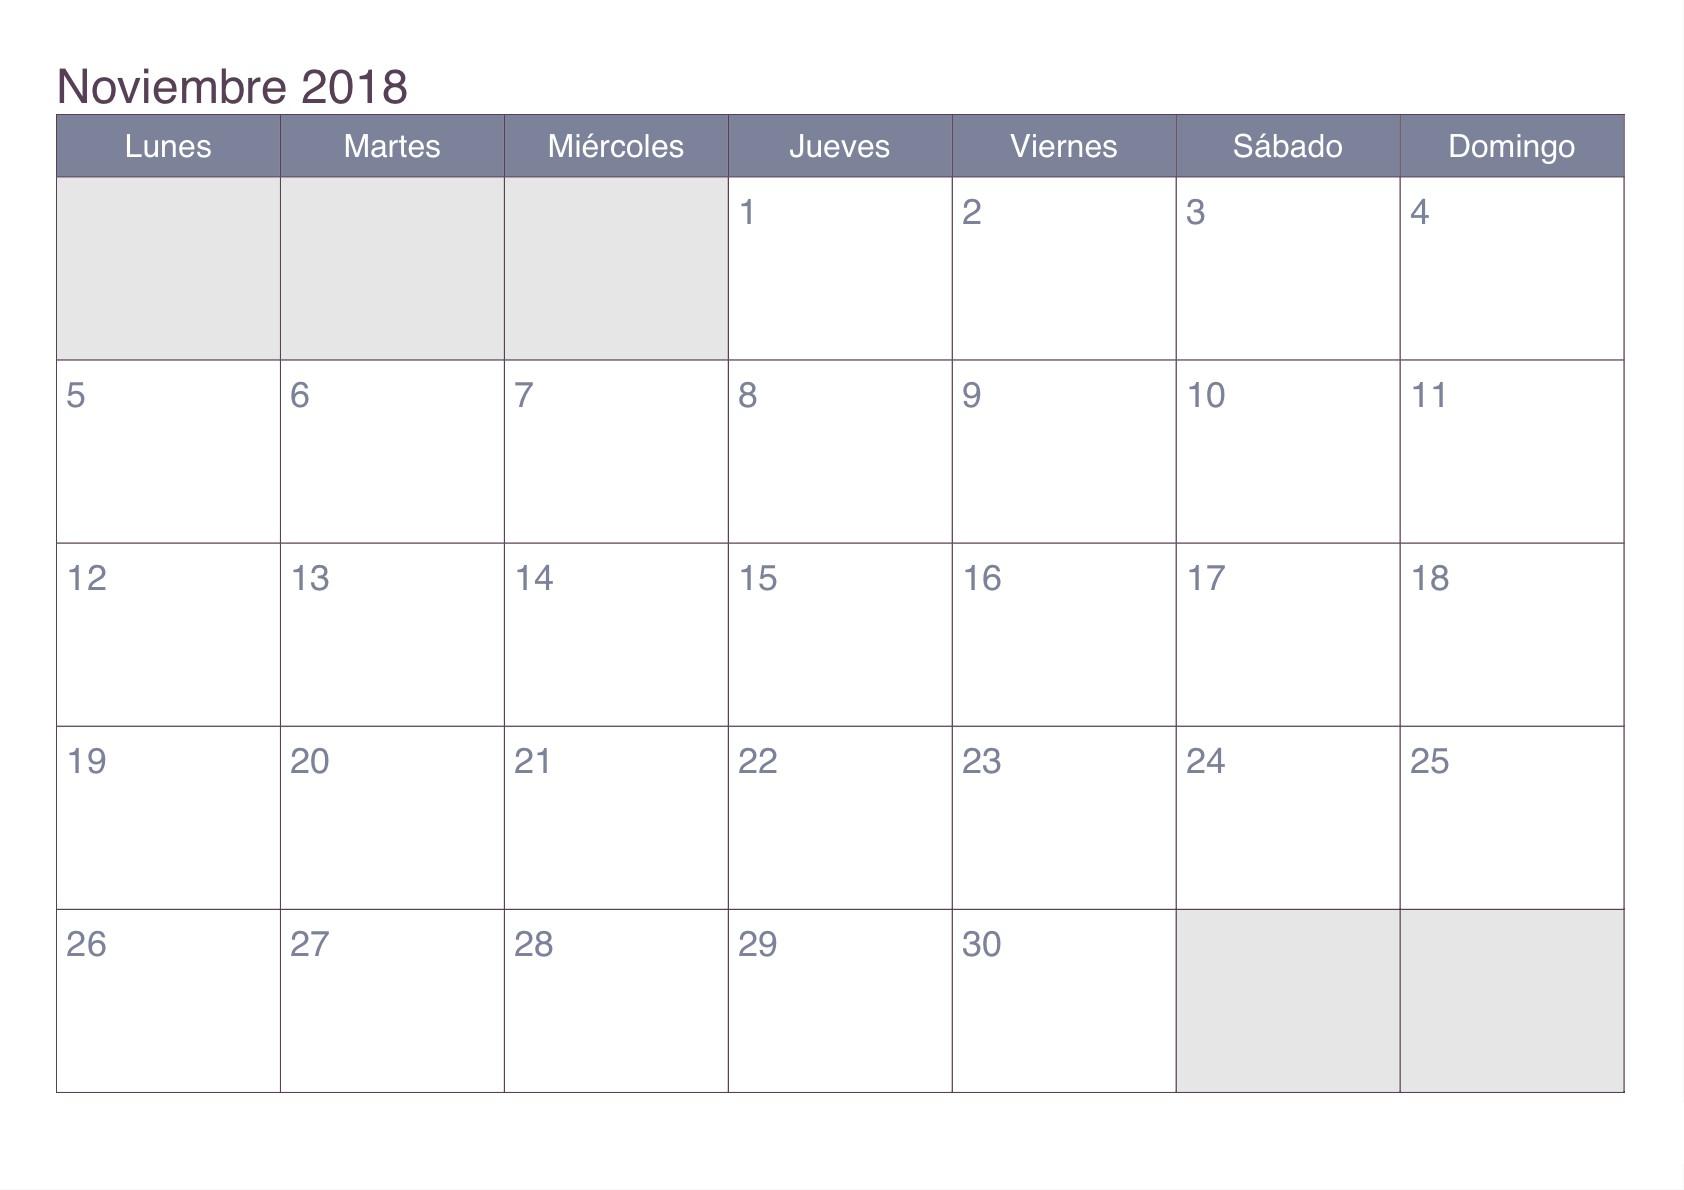 Calendario De Google Para Imprimir Más Reciente Calendario Noviembre 2018 Para Imprimir Image Of Calendario De Google Para Imprimir Recientes 165 Best Ideas Para Planificador Images On Pinterest